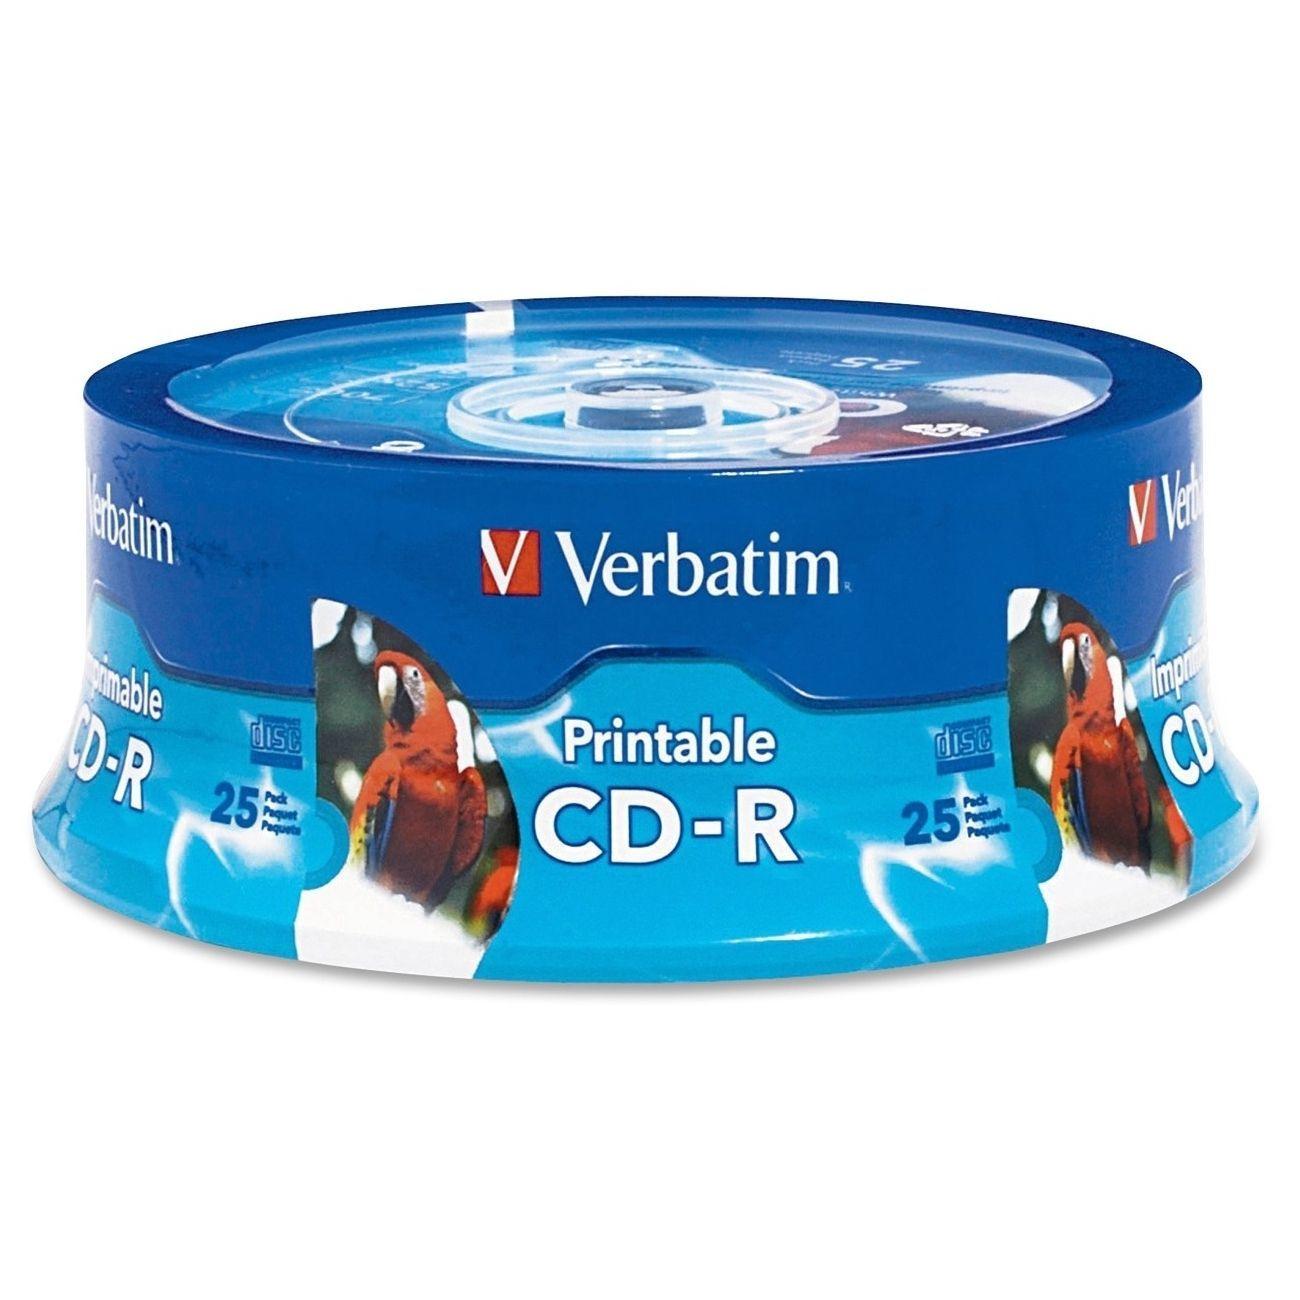 Verbatim dvd rw 4 7gb 4x with branded surface 30pk spindle 4 7gb - Verbatim 80 Minute White Inkjet Printable Hub Printable Recordable Disc Cd R Spindle 96189